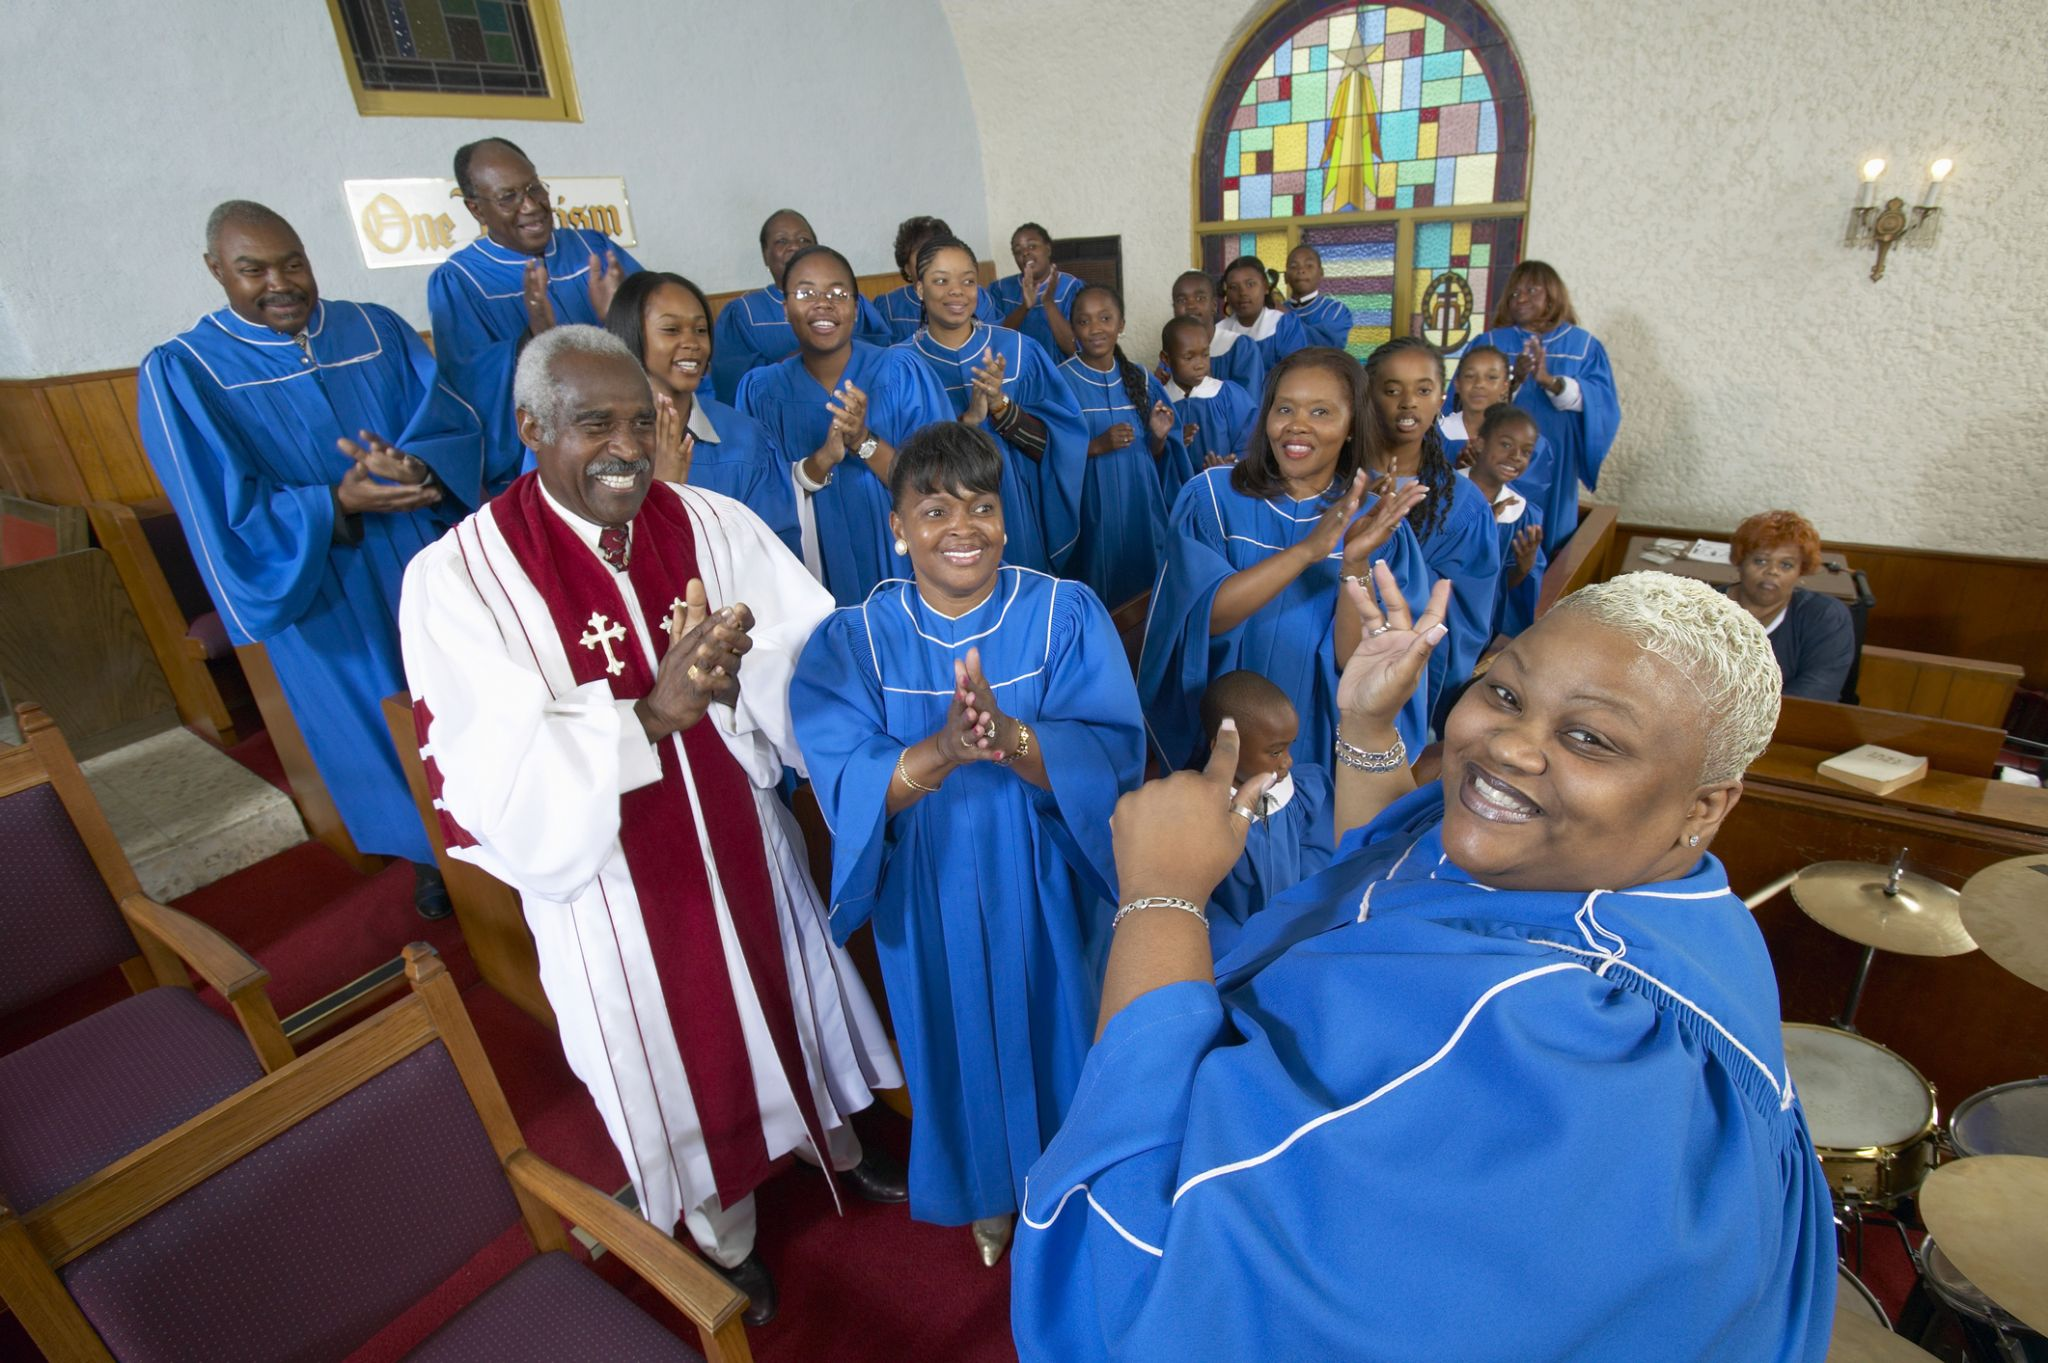 40 person gospel choir etiquette - HD2048×1363